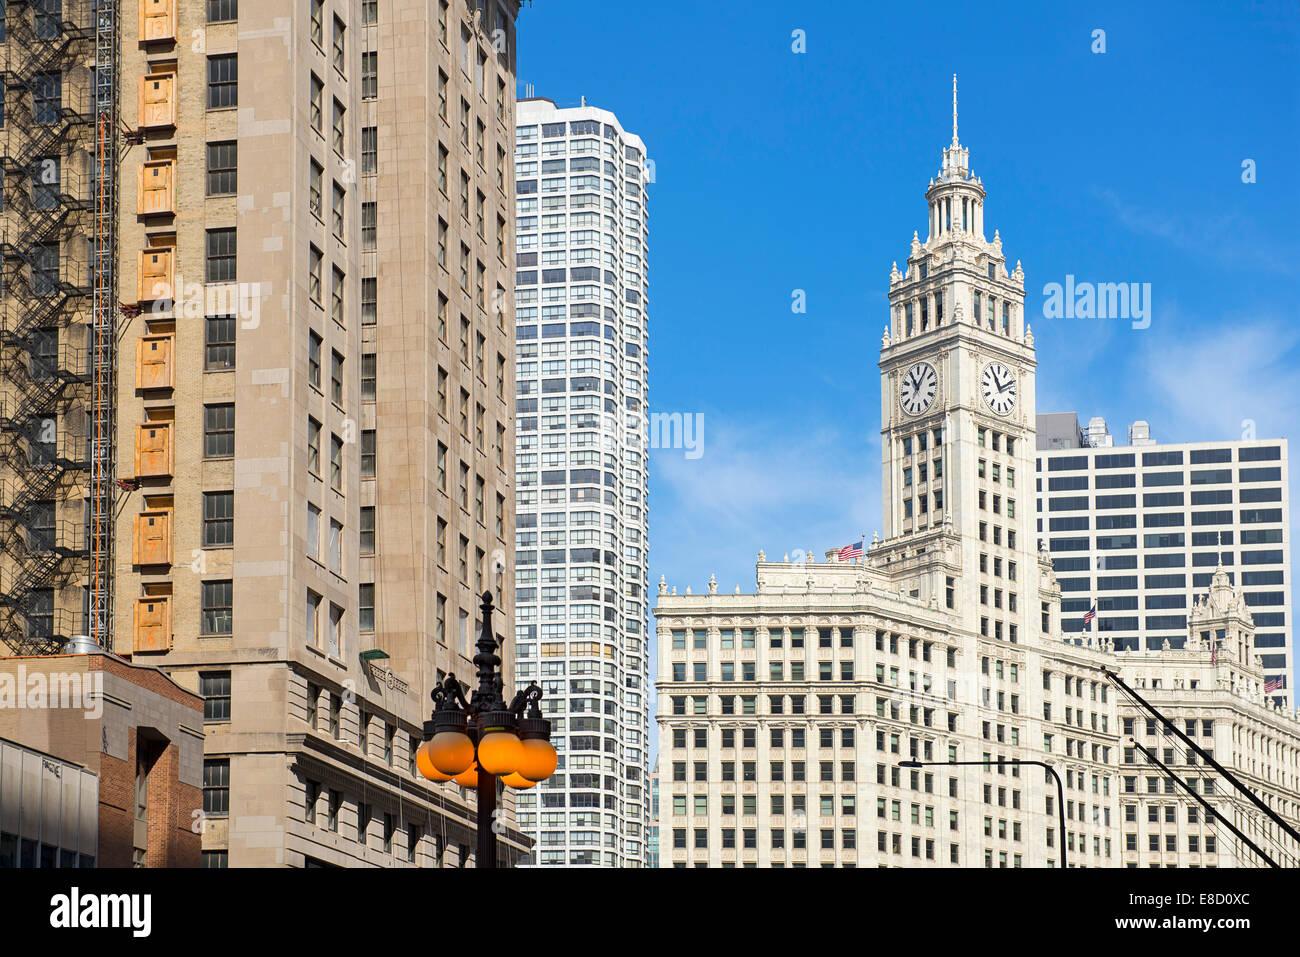 Wrigley Building Chicago Hochhäuser, Hochhaus Stockfoto